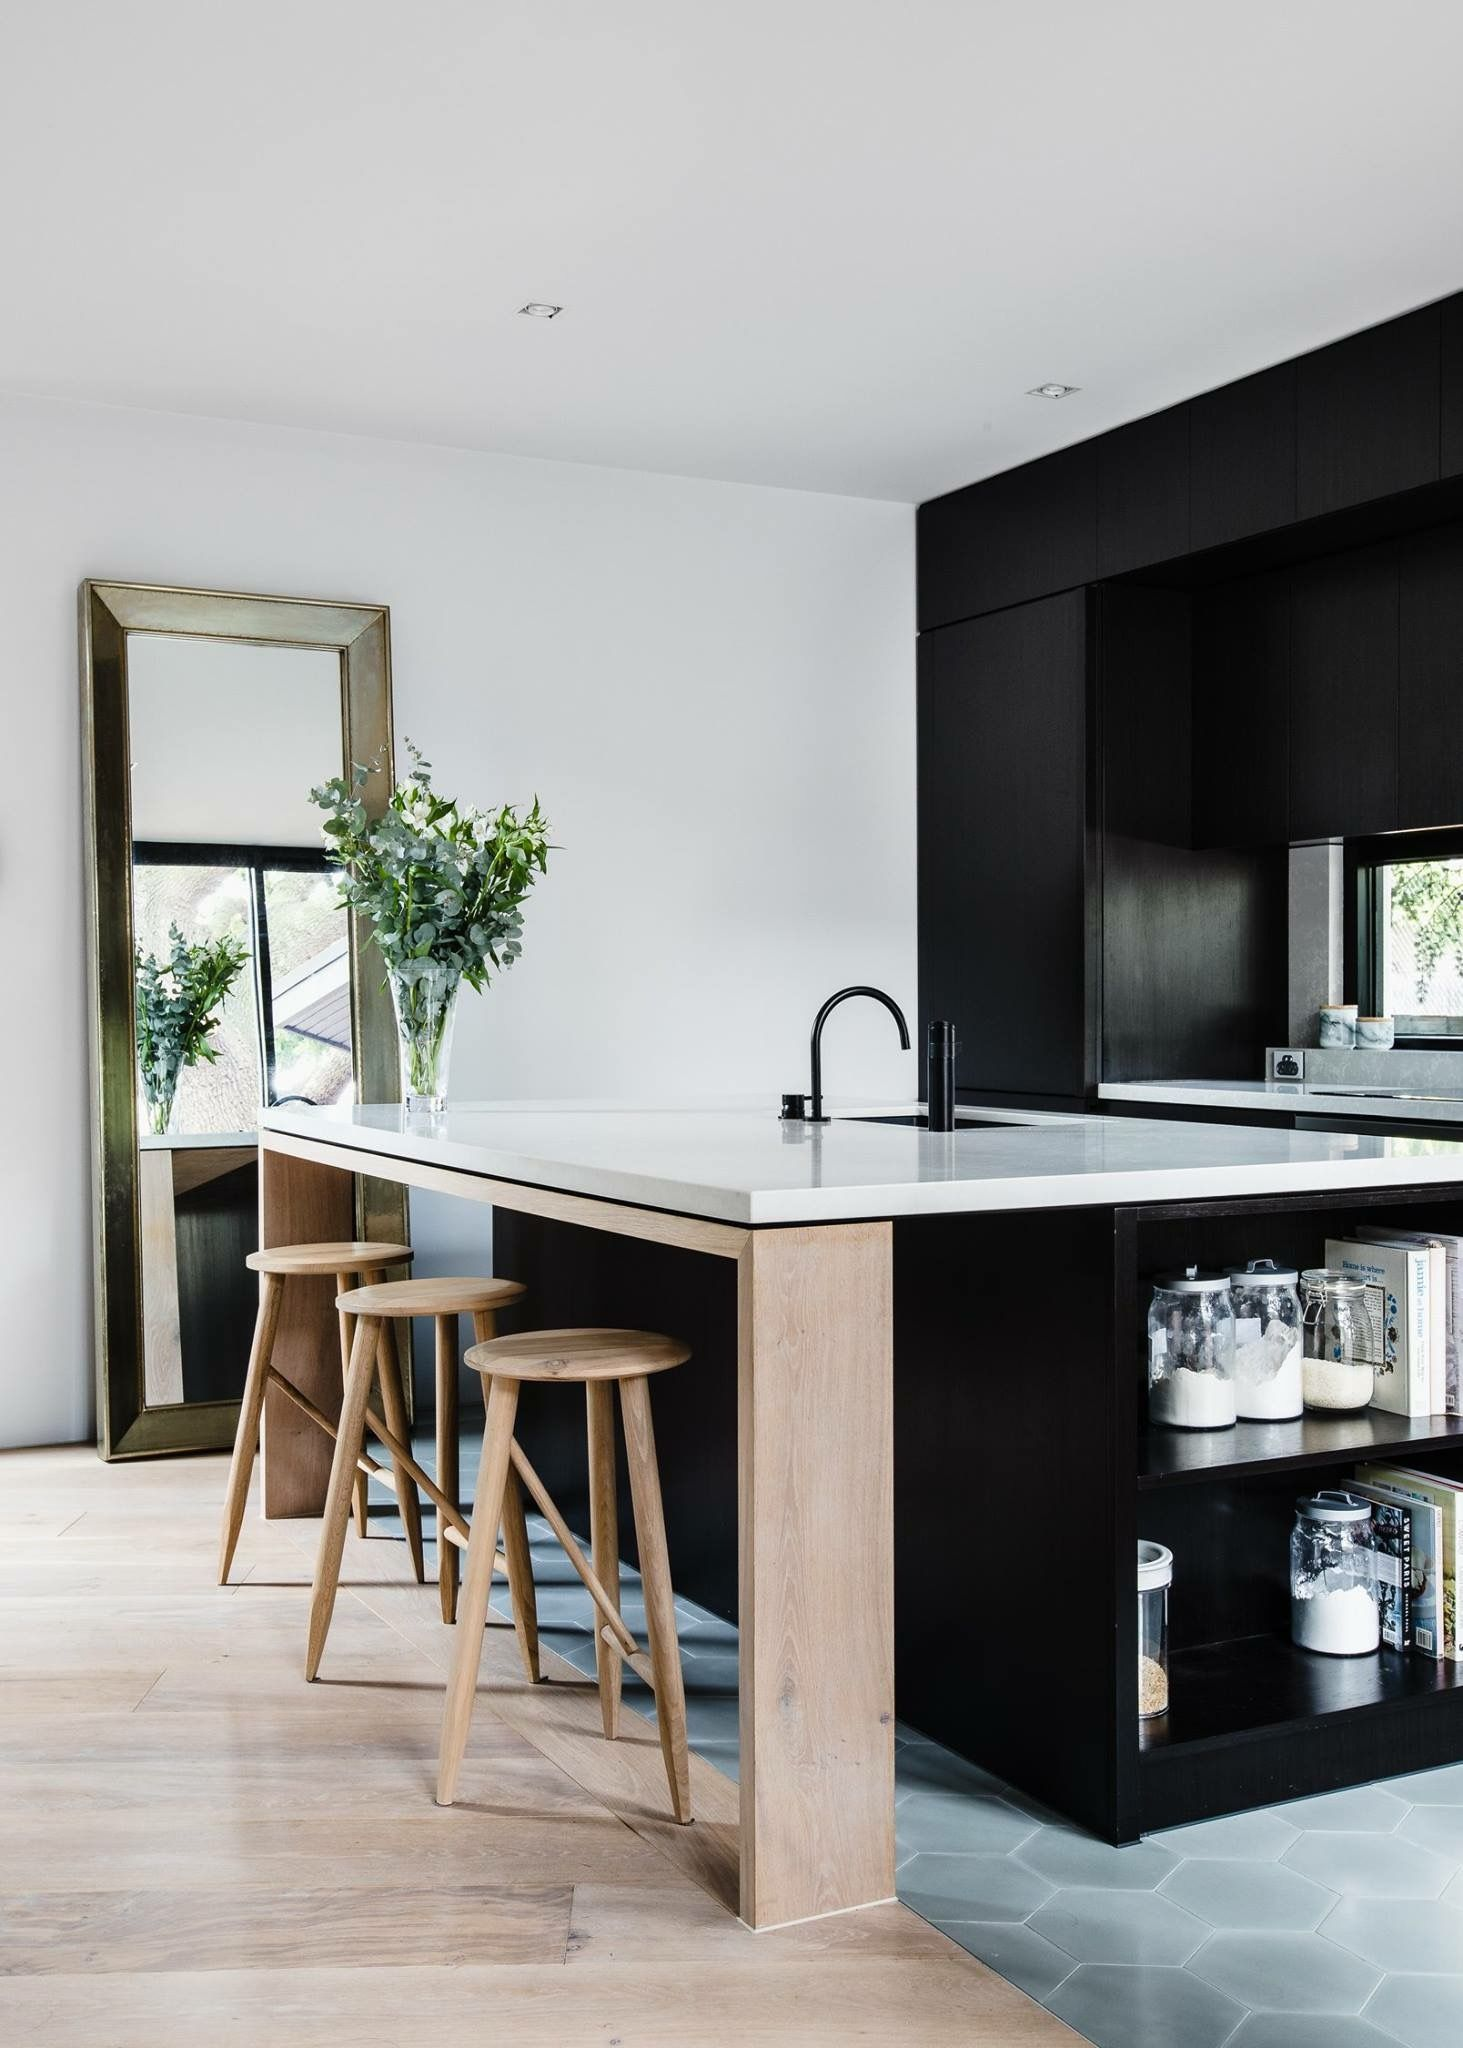 Pin by yiya arévalo on kitchen pinterest kitchens interiors and